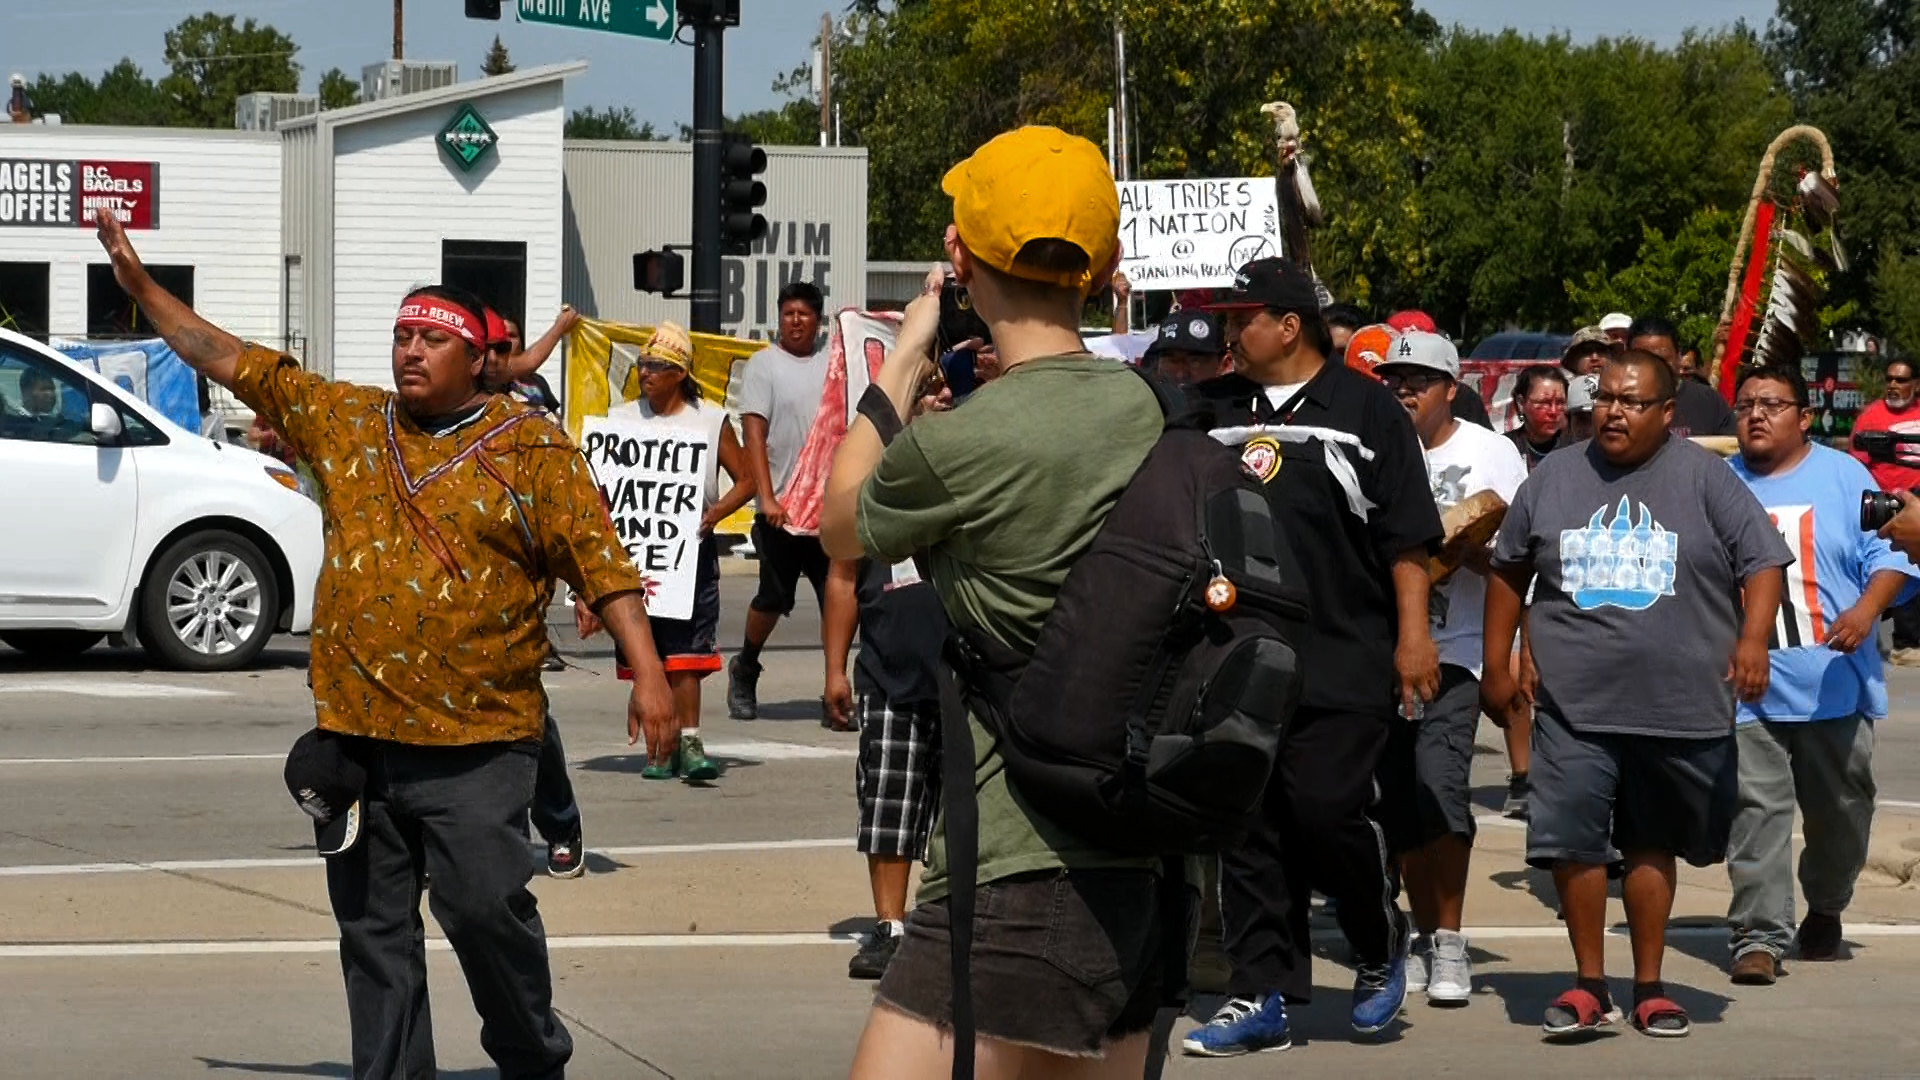 #NoDAPL protestors near the Memorial Bridge in Bismarck, ND.Photo by Mike Glatt.